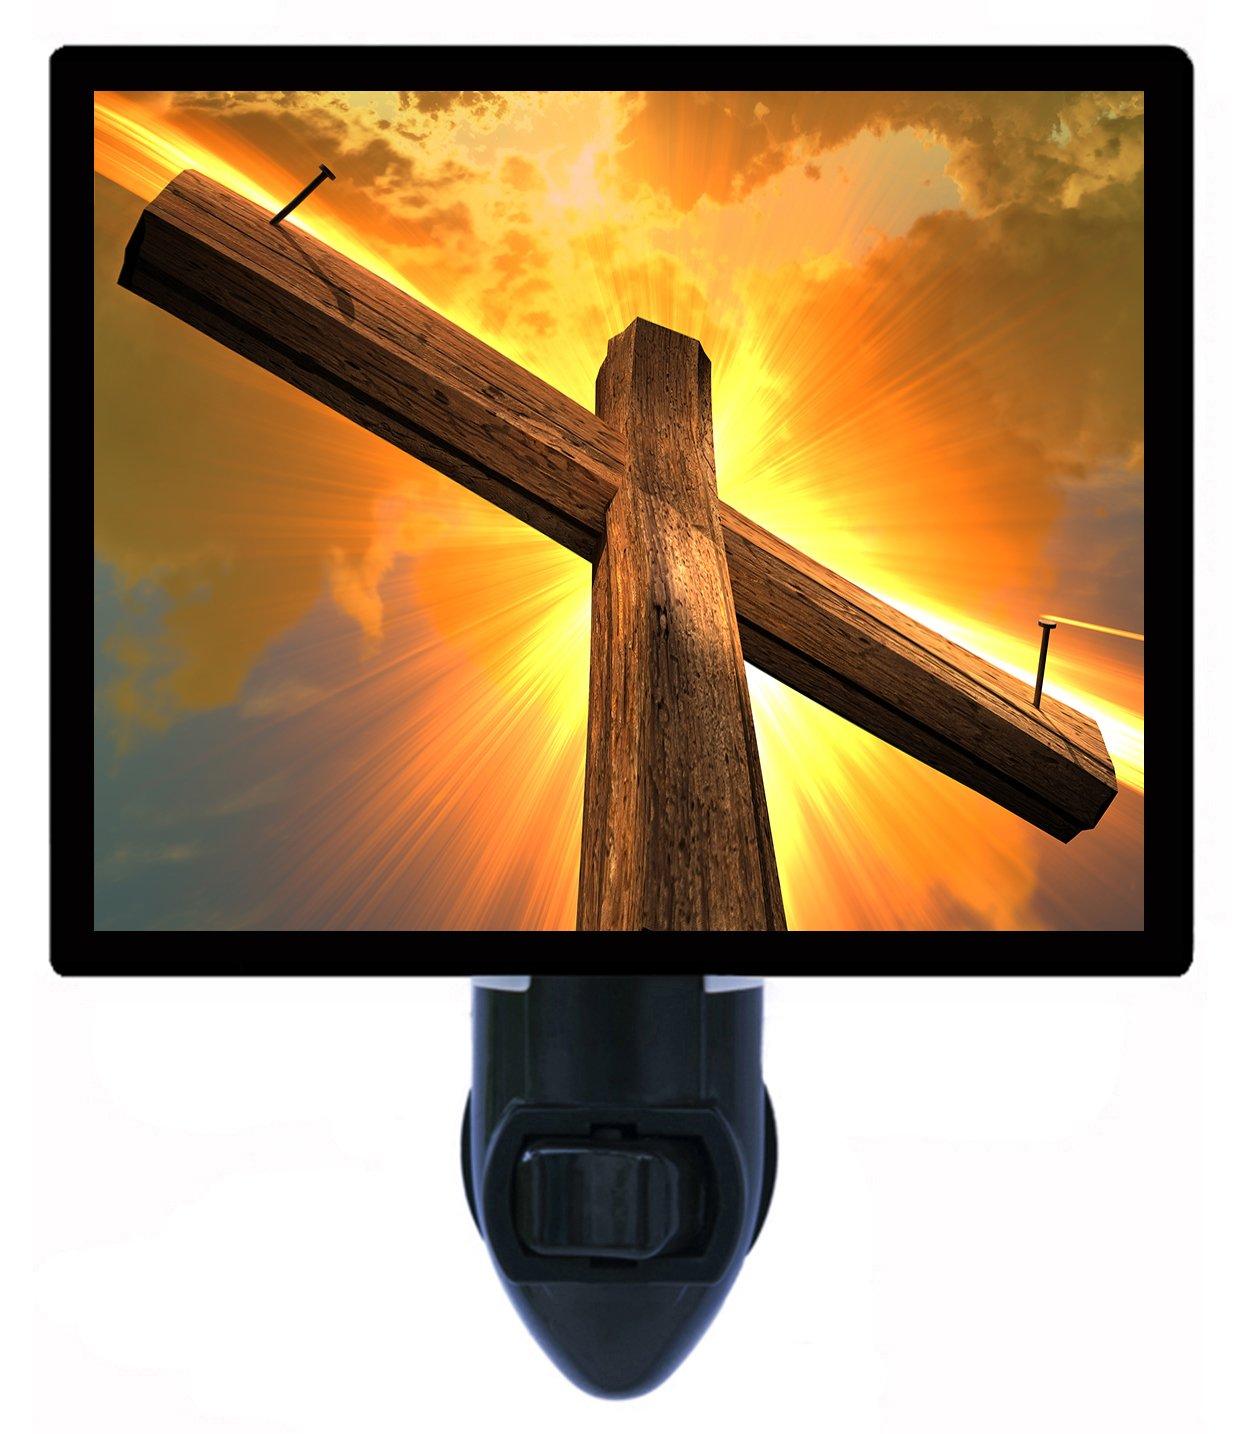 Night Light - Nails in Cross - Religious - Christian - Jesus